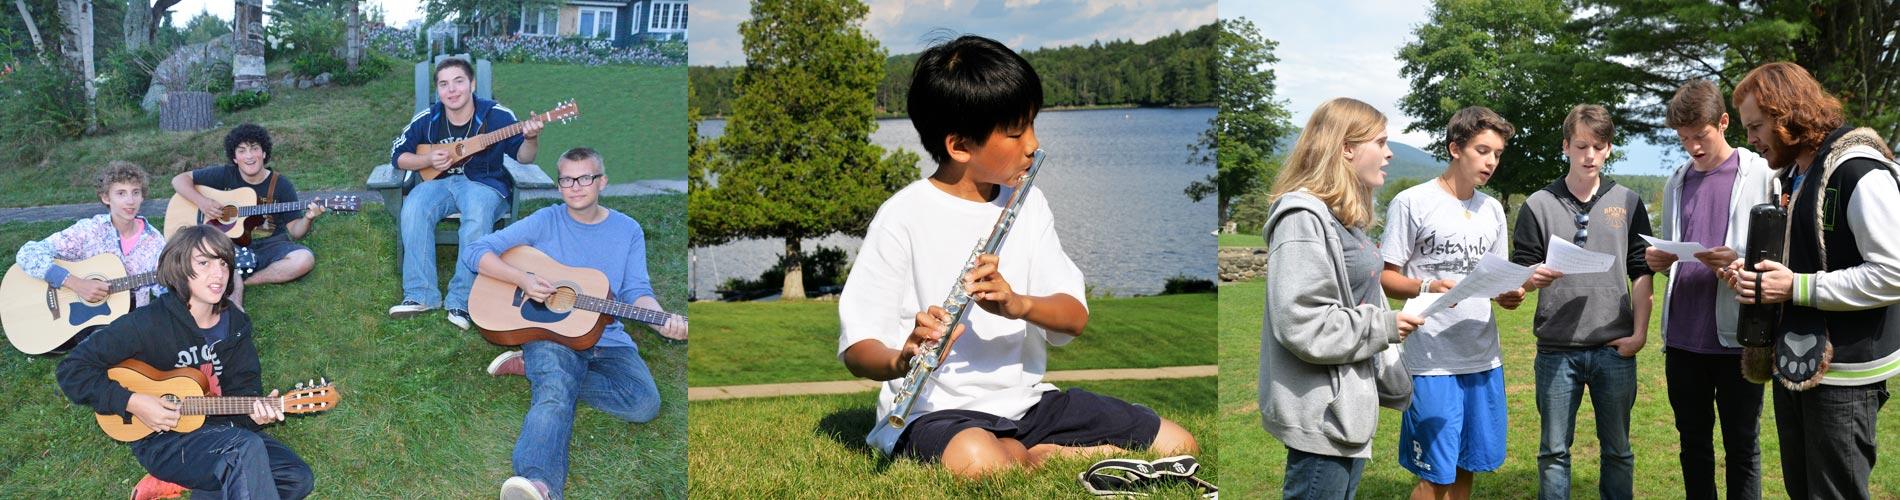 music-camp-003